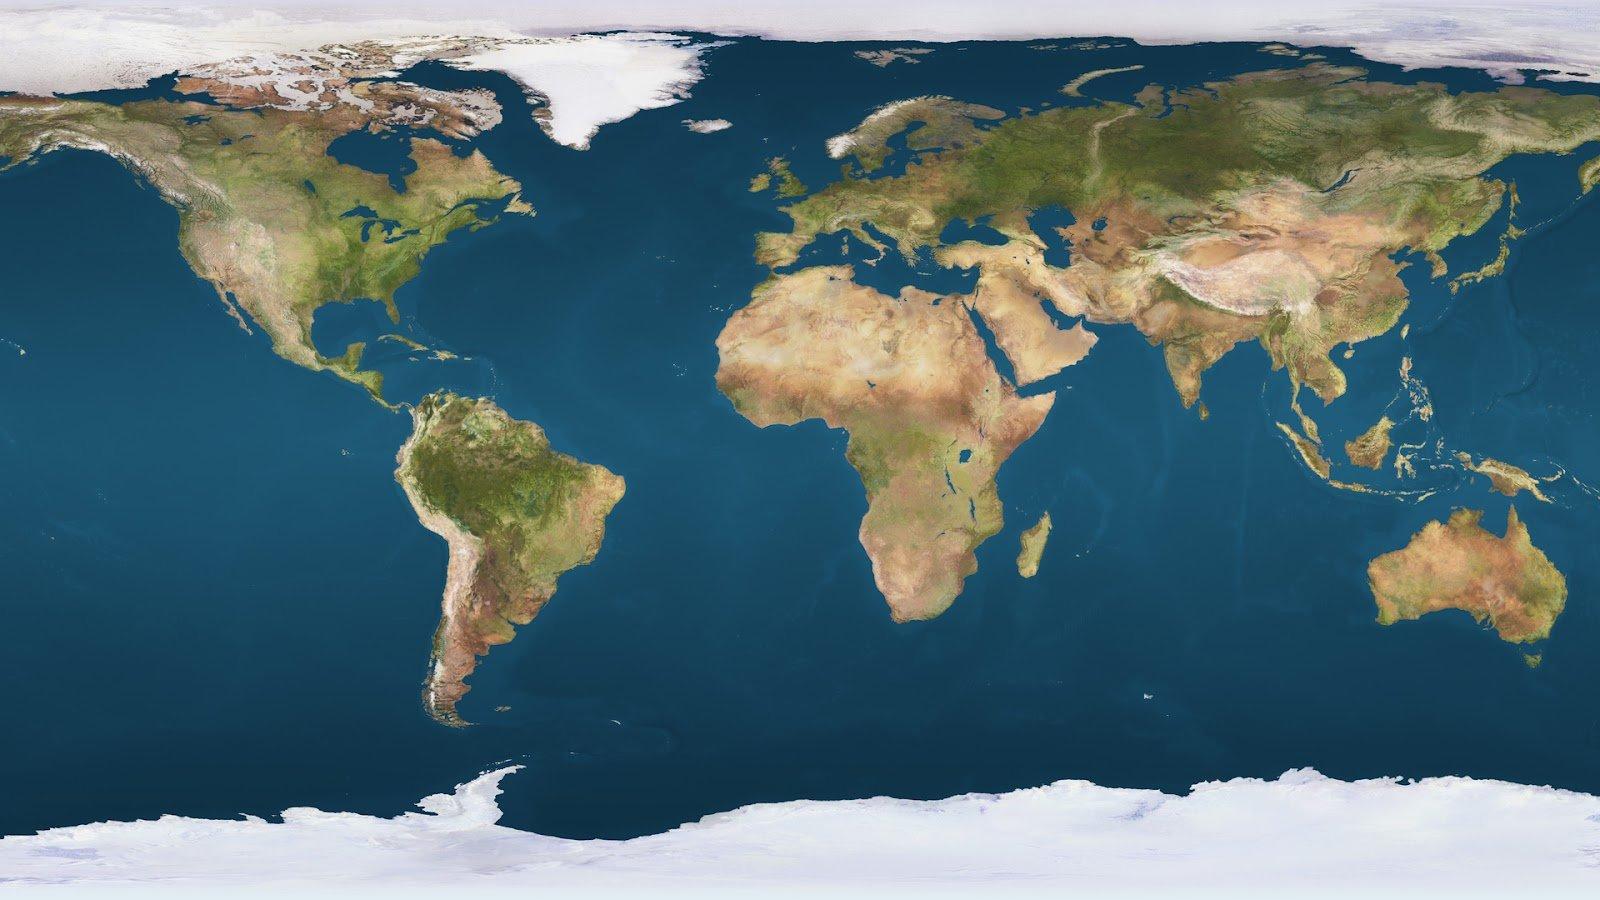 74+] World Map Wallpaper High Resolution on WallpaperSafari